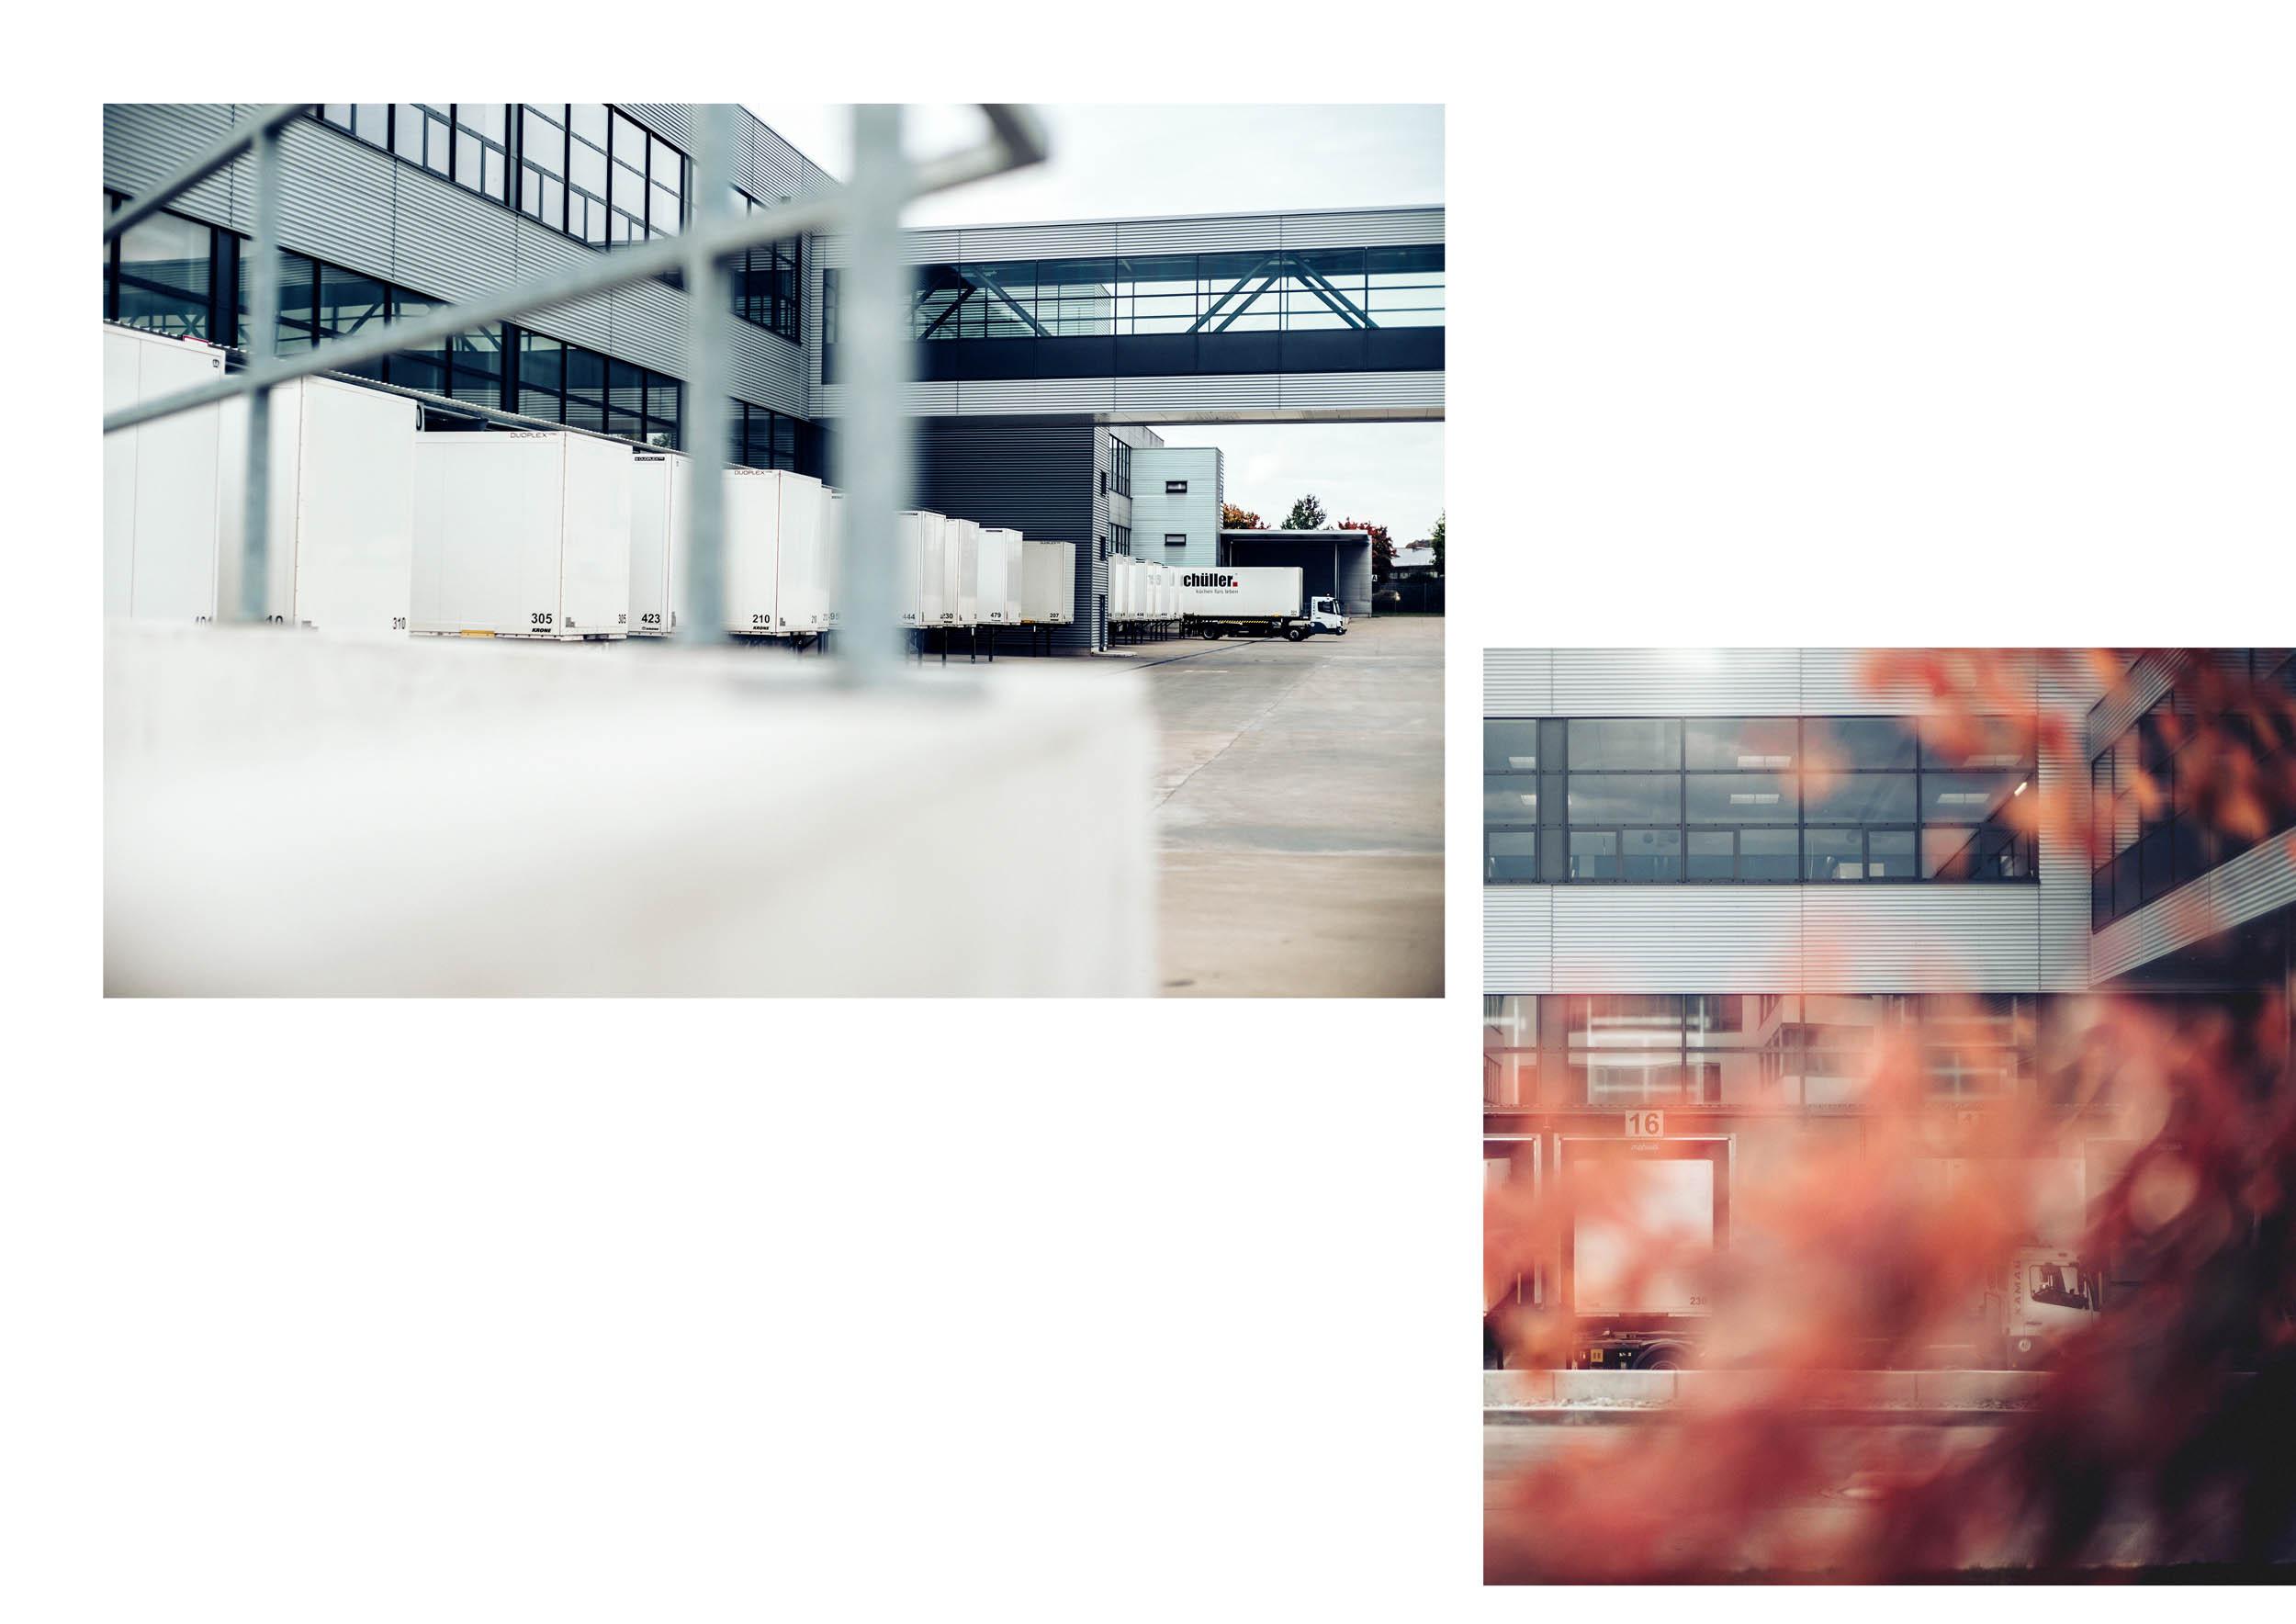 2018_SeifertUebler_schueller_kuechen_corporate_portrait_industrial_photography_004.jpg